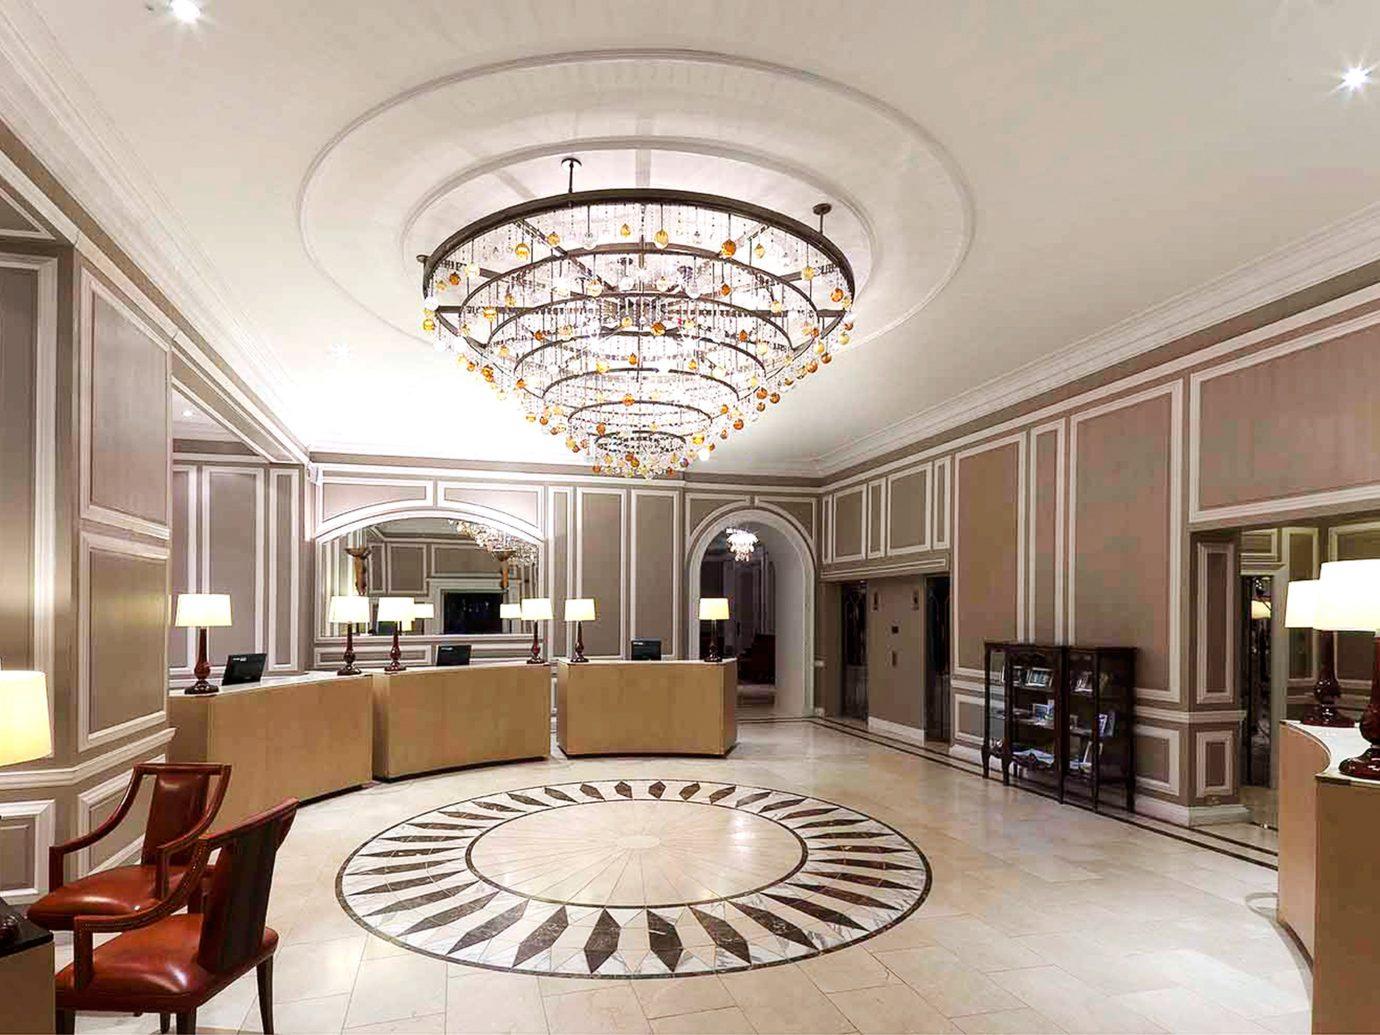 Lobby at Waldorf Astoria Caledonian